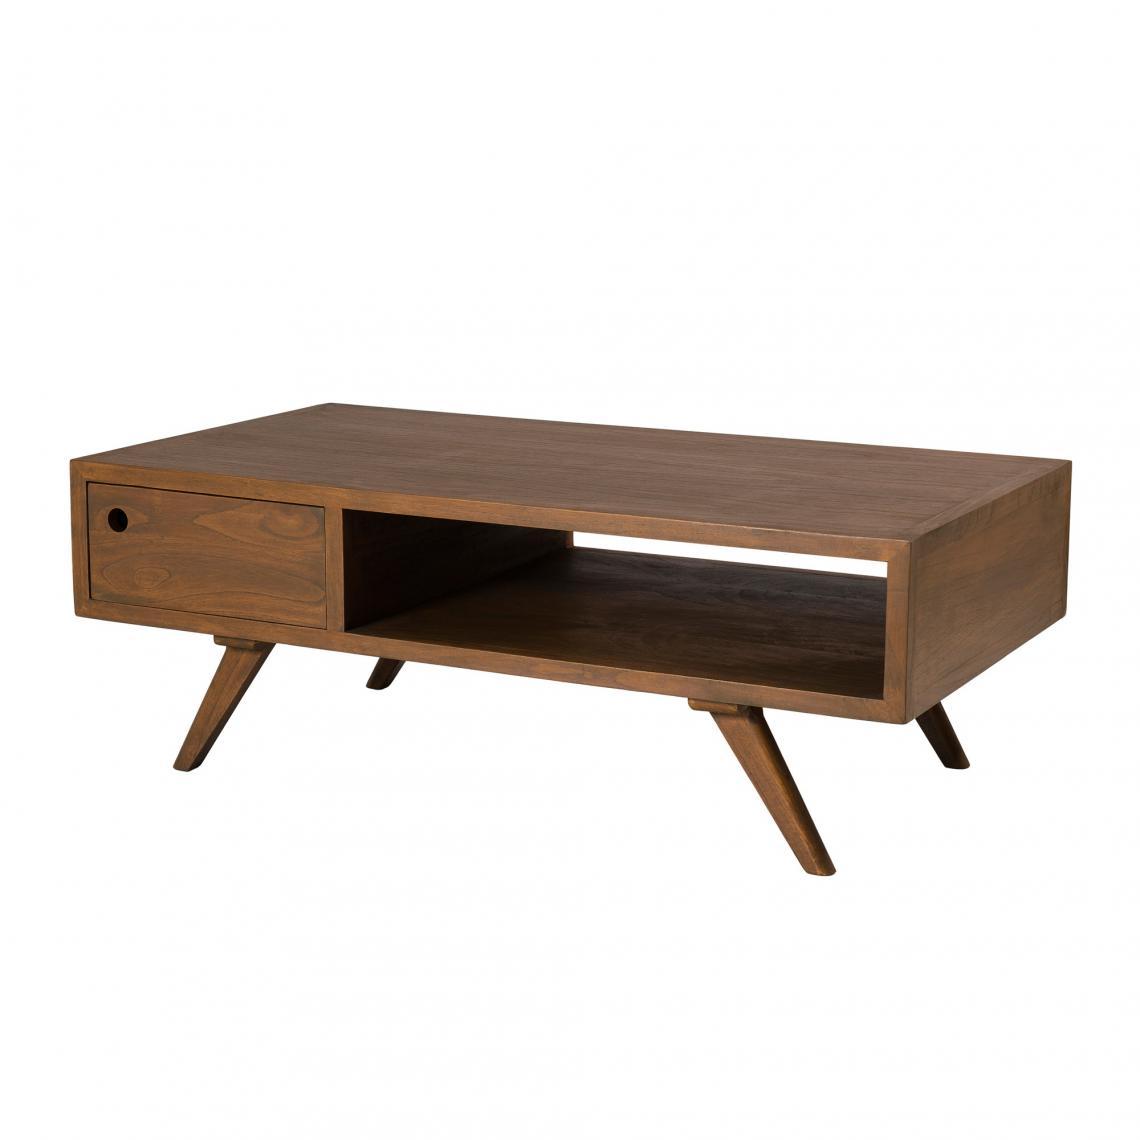 Table Basse 1 Tiroir Double Style Scandinave Cannelle